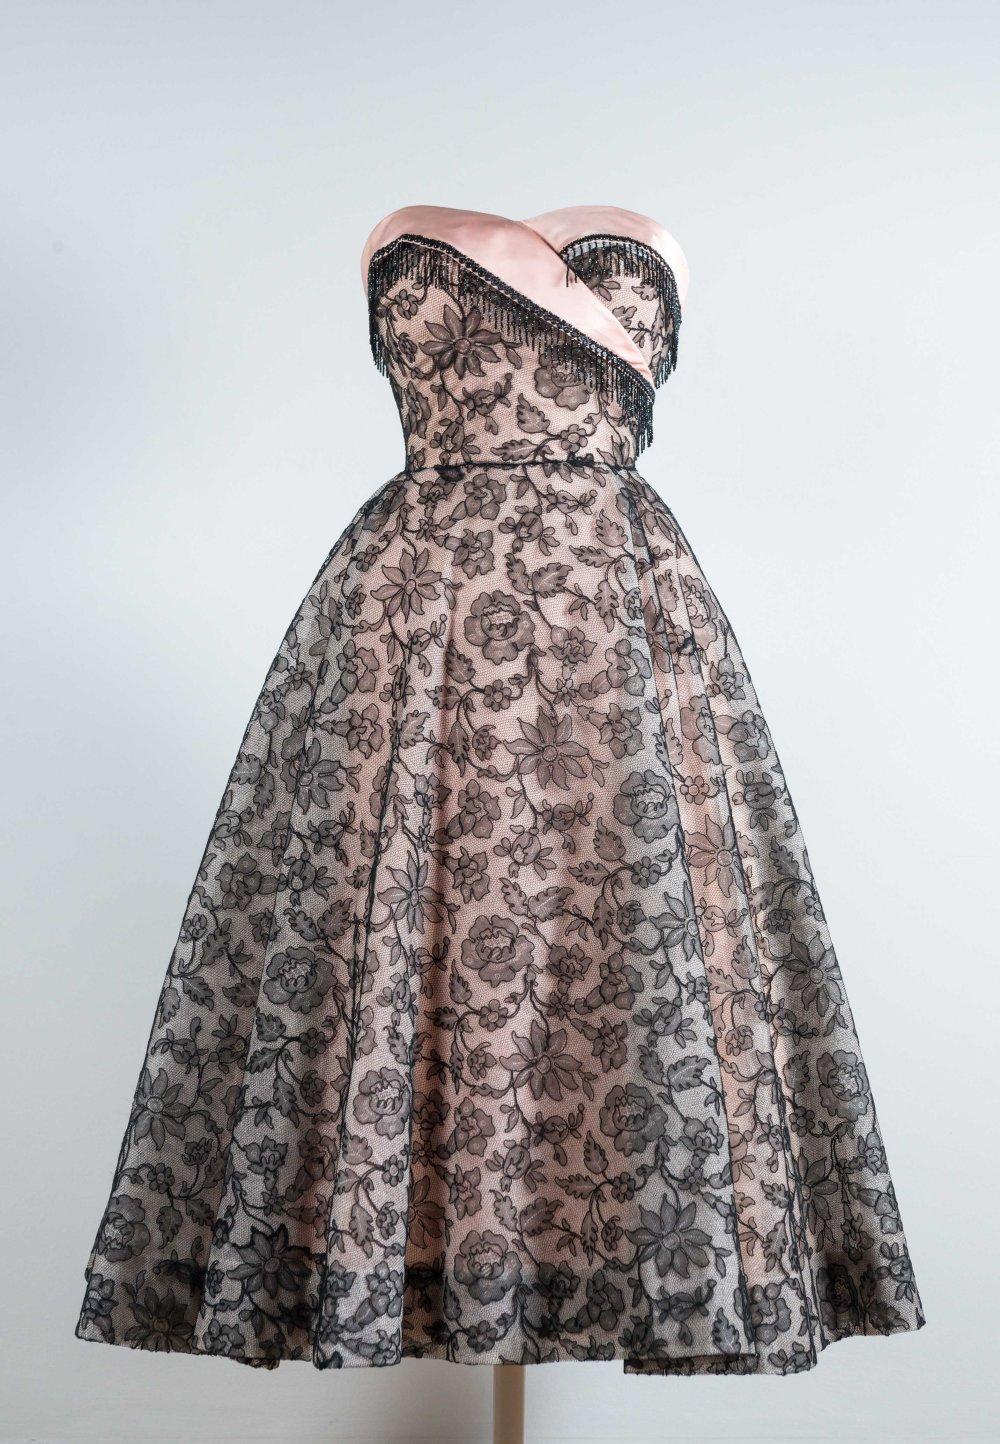 Kensington Palace Royal fashion